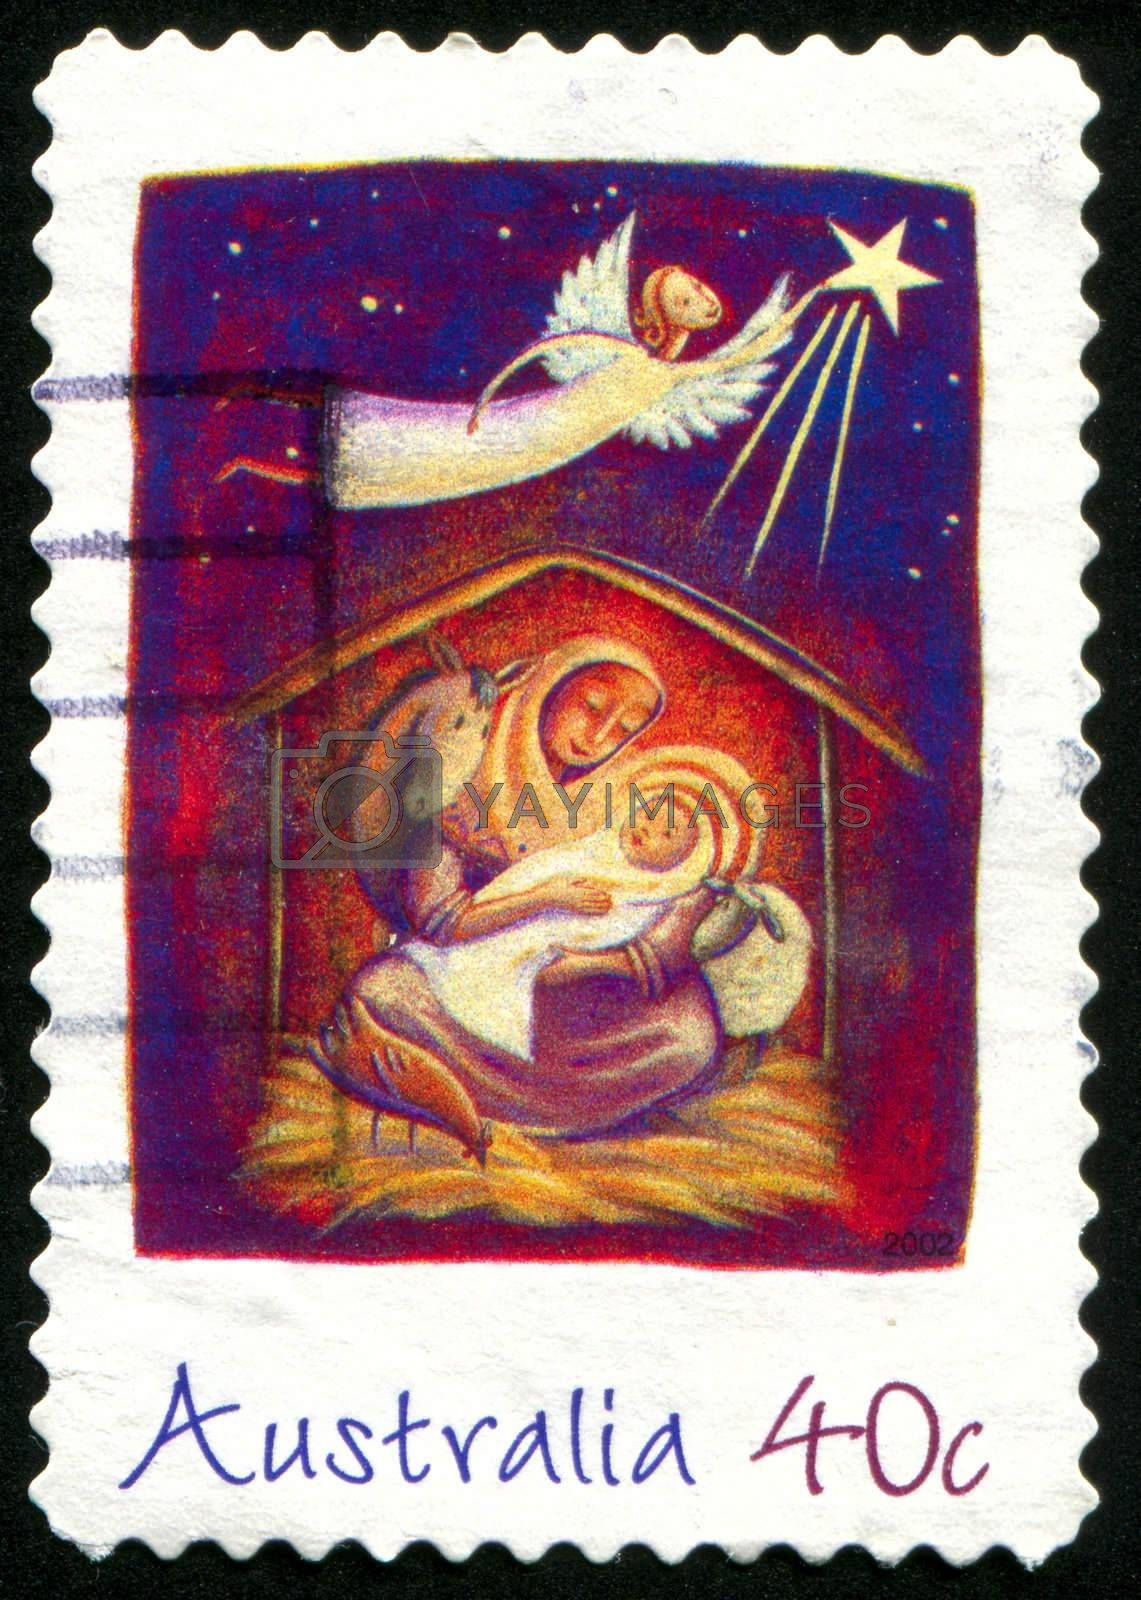 AUSTRALIA - CIRCA 2002: stamp printed by Australia, shows Christmas, circa 2002